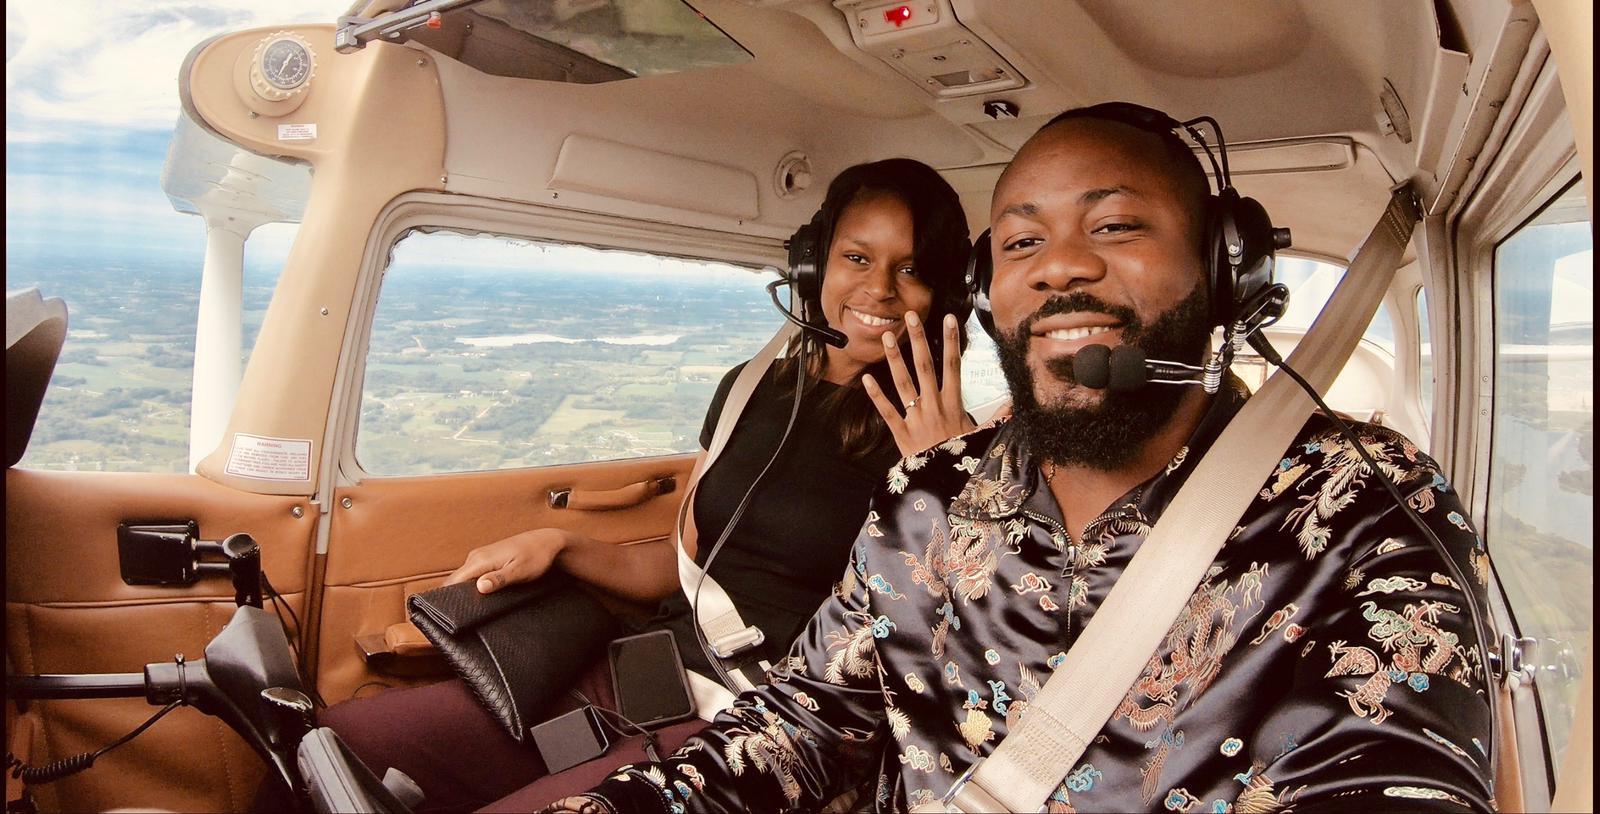 Nigerian Man Samuel Enyi aka DJ IREM becomes the first Black man to engage his fiance on a single engine airplane